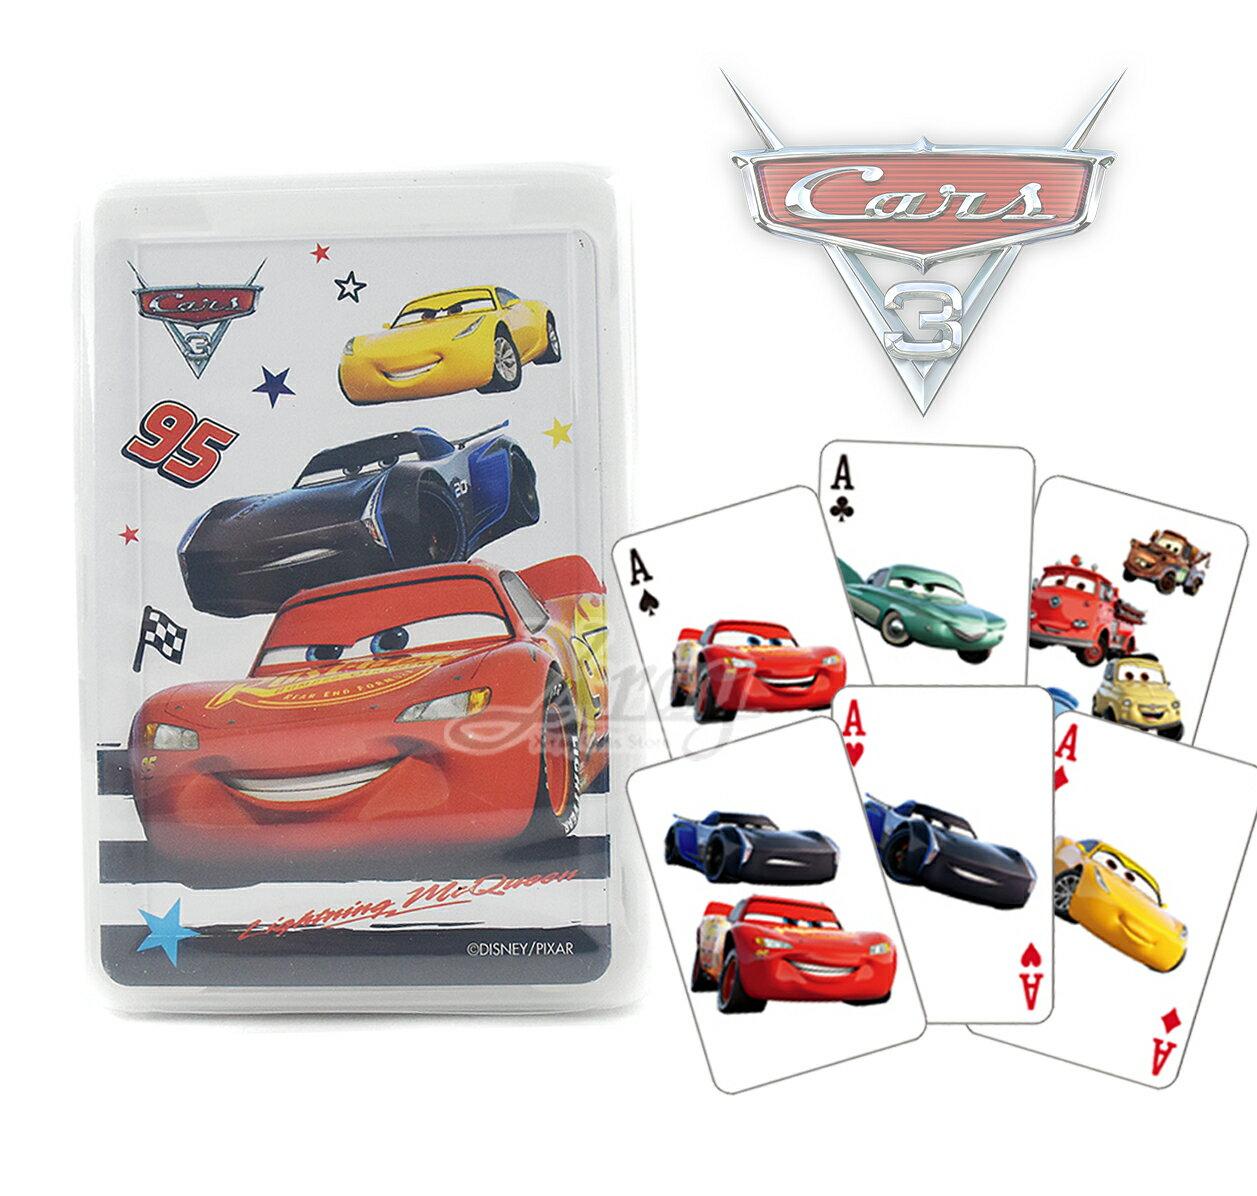 X射線【C534096】Cars3撲克牌,閃電麥坤/益智遊戲/玩具/桌遊/童玩/兒童節/送禮